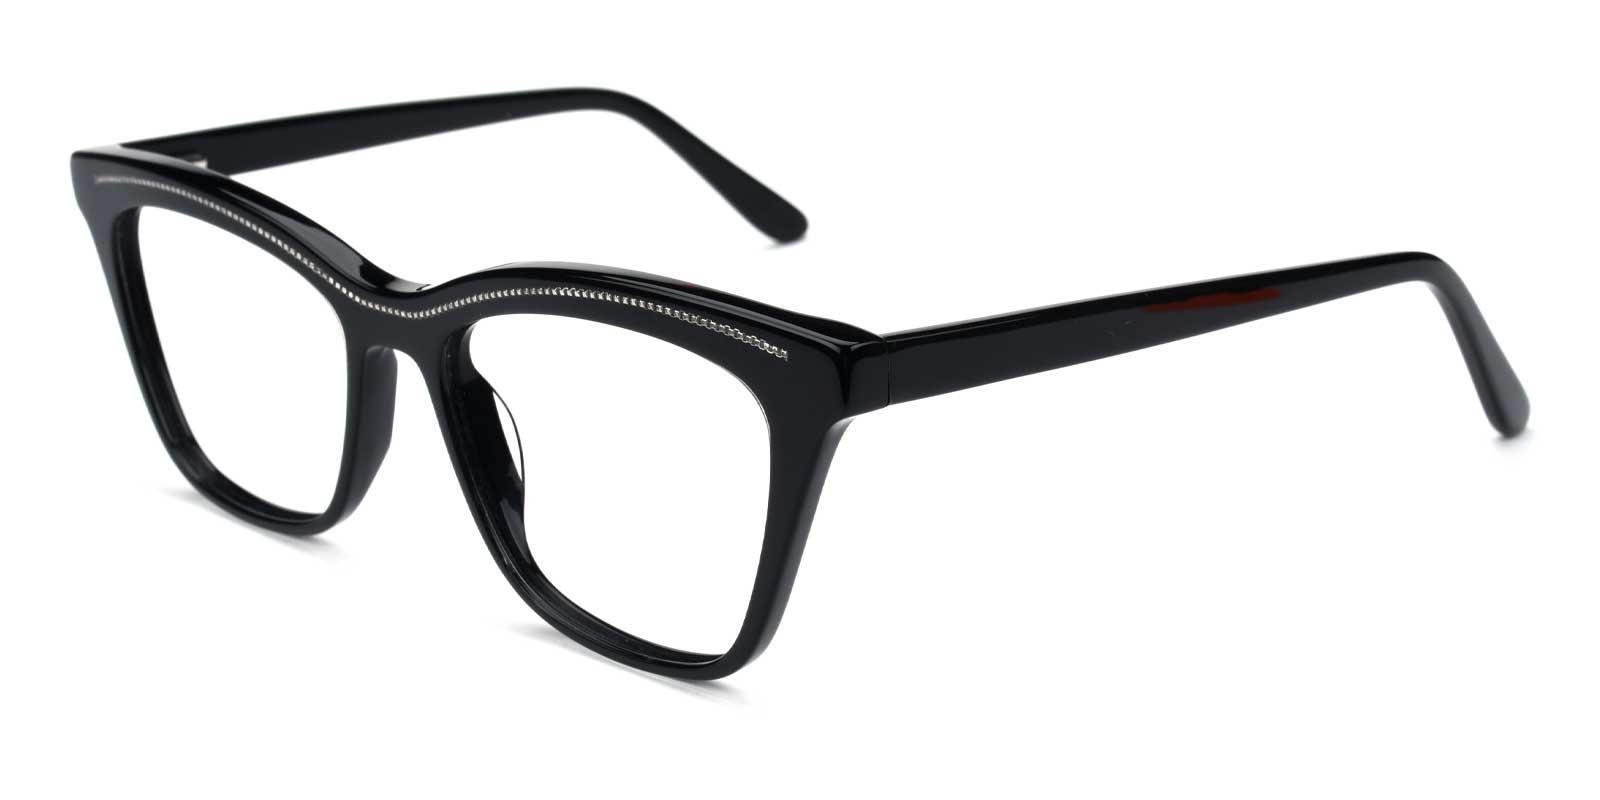 Tina-Black-Browline-Acetate-Eyeglasses-additional1